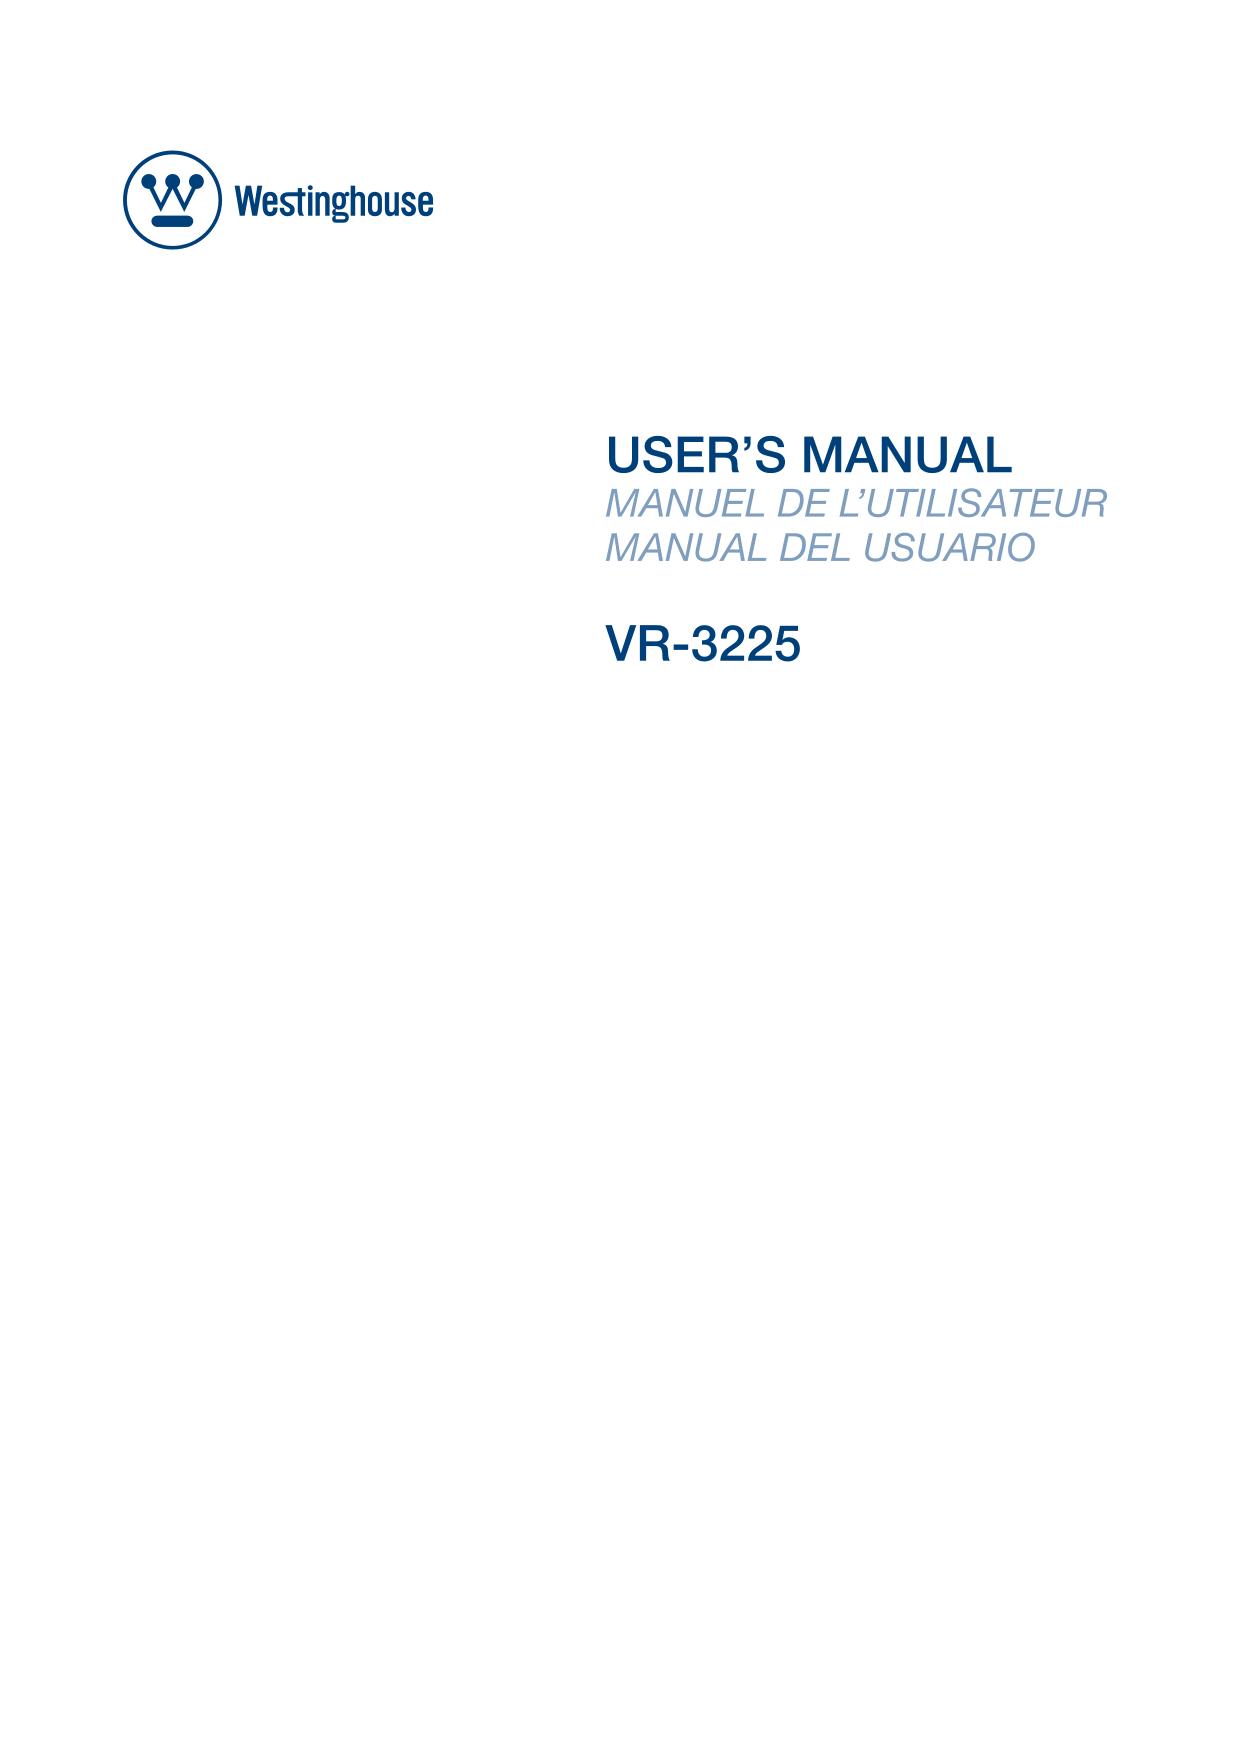 download free pdf for westinghouse vr 3225 tv manual rh umlib com westinghouse tv vr-3225 manual westinghouse tv vr-3225 manual